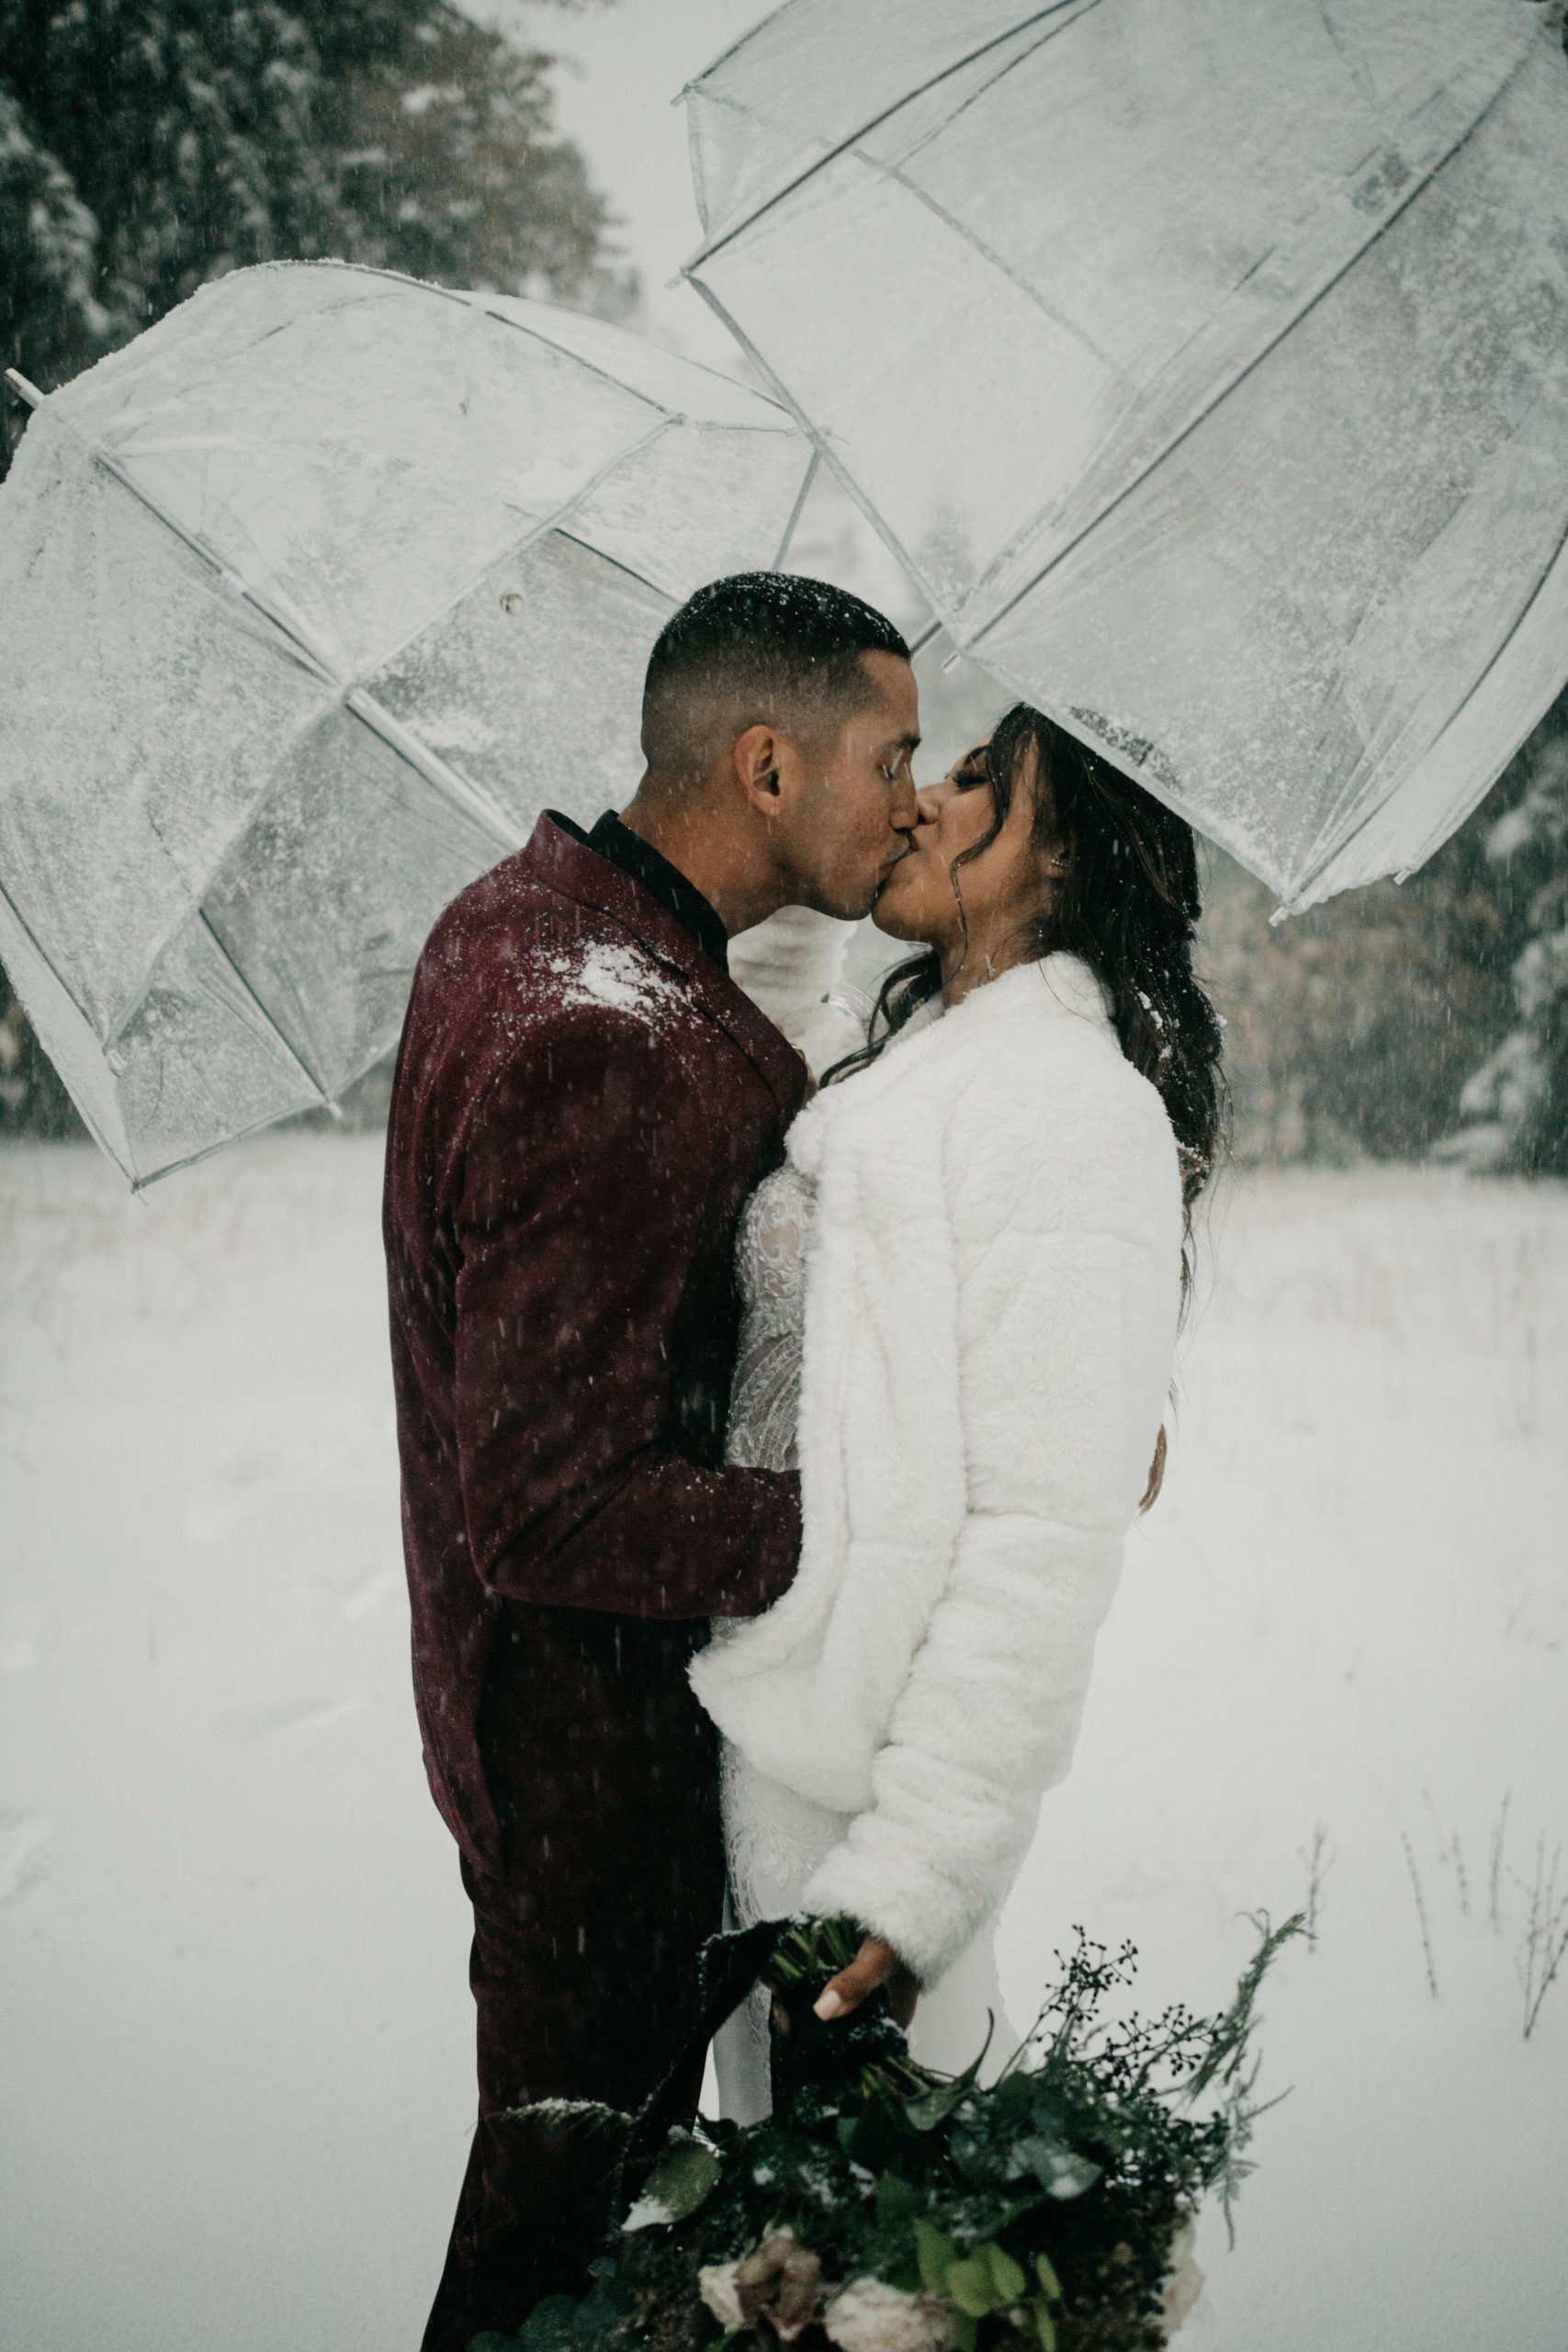 Bride and Groom portraits in the snow near Arrowhead Pine Rose Wedding, image by Fatima Elreda Photo